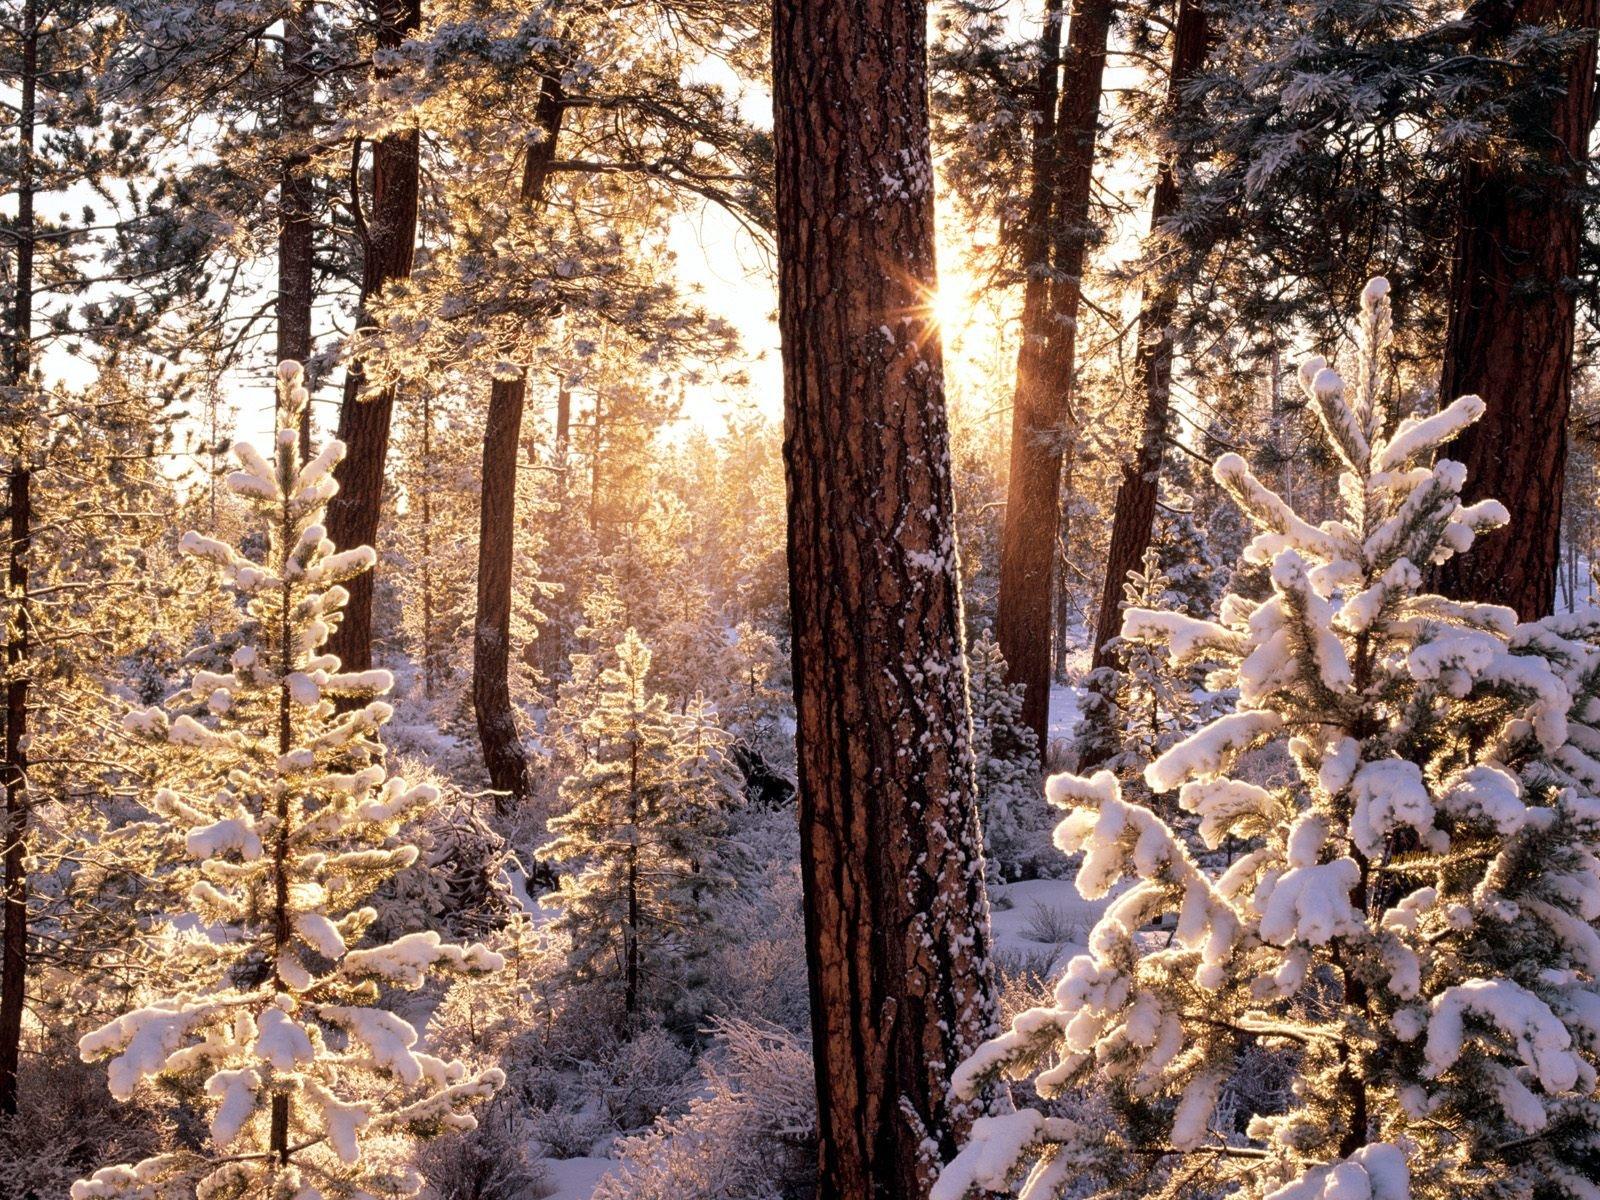 фото картинки на телефон зима каждого человека, знающего